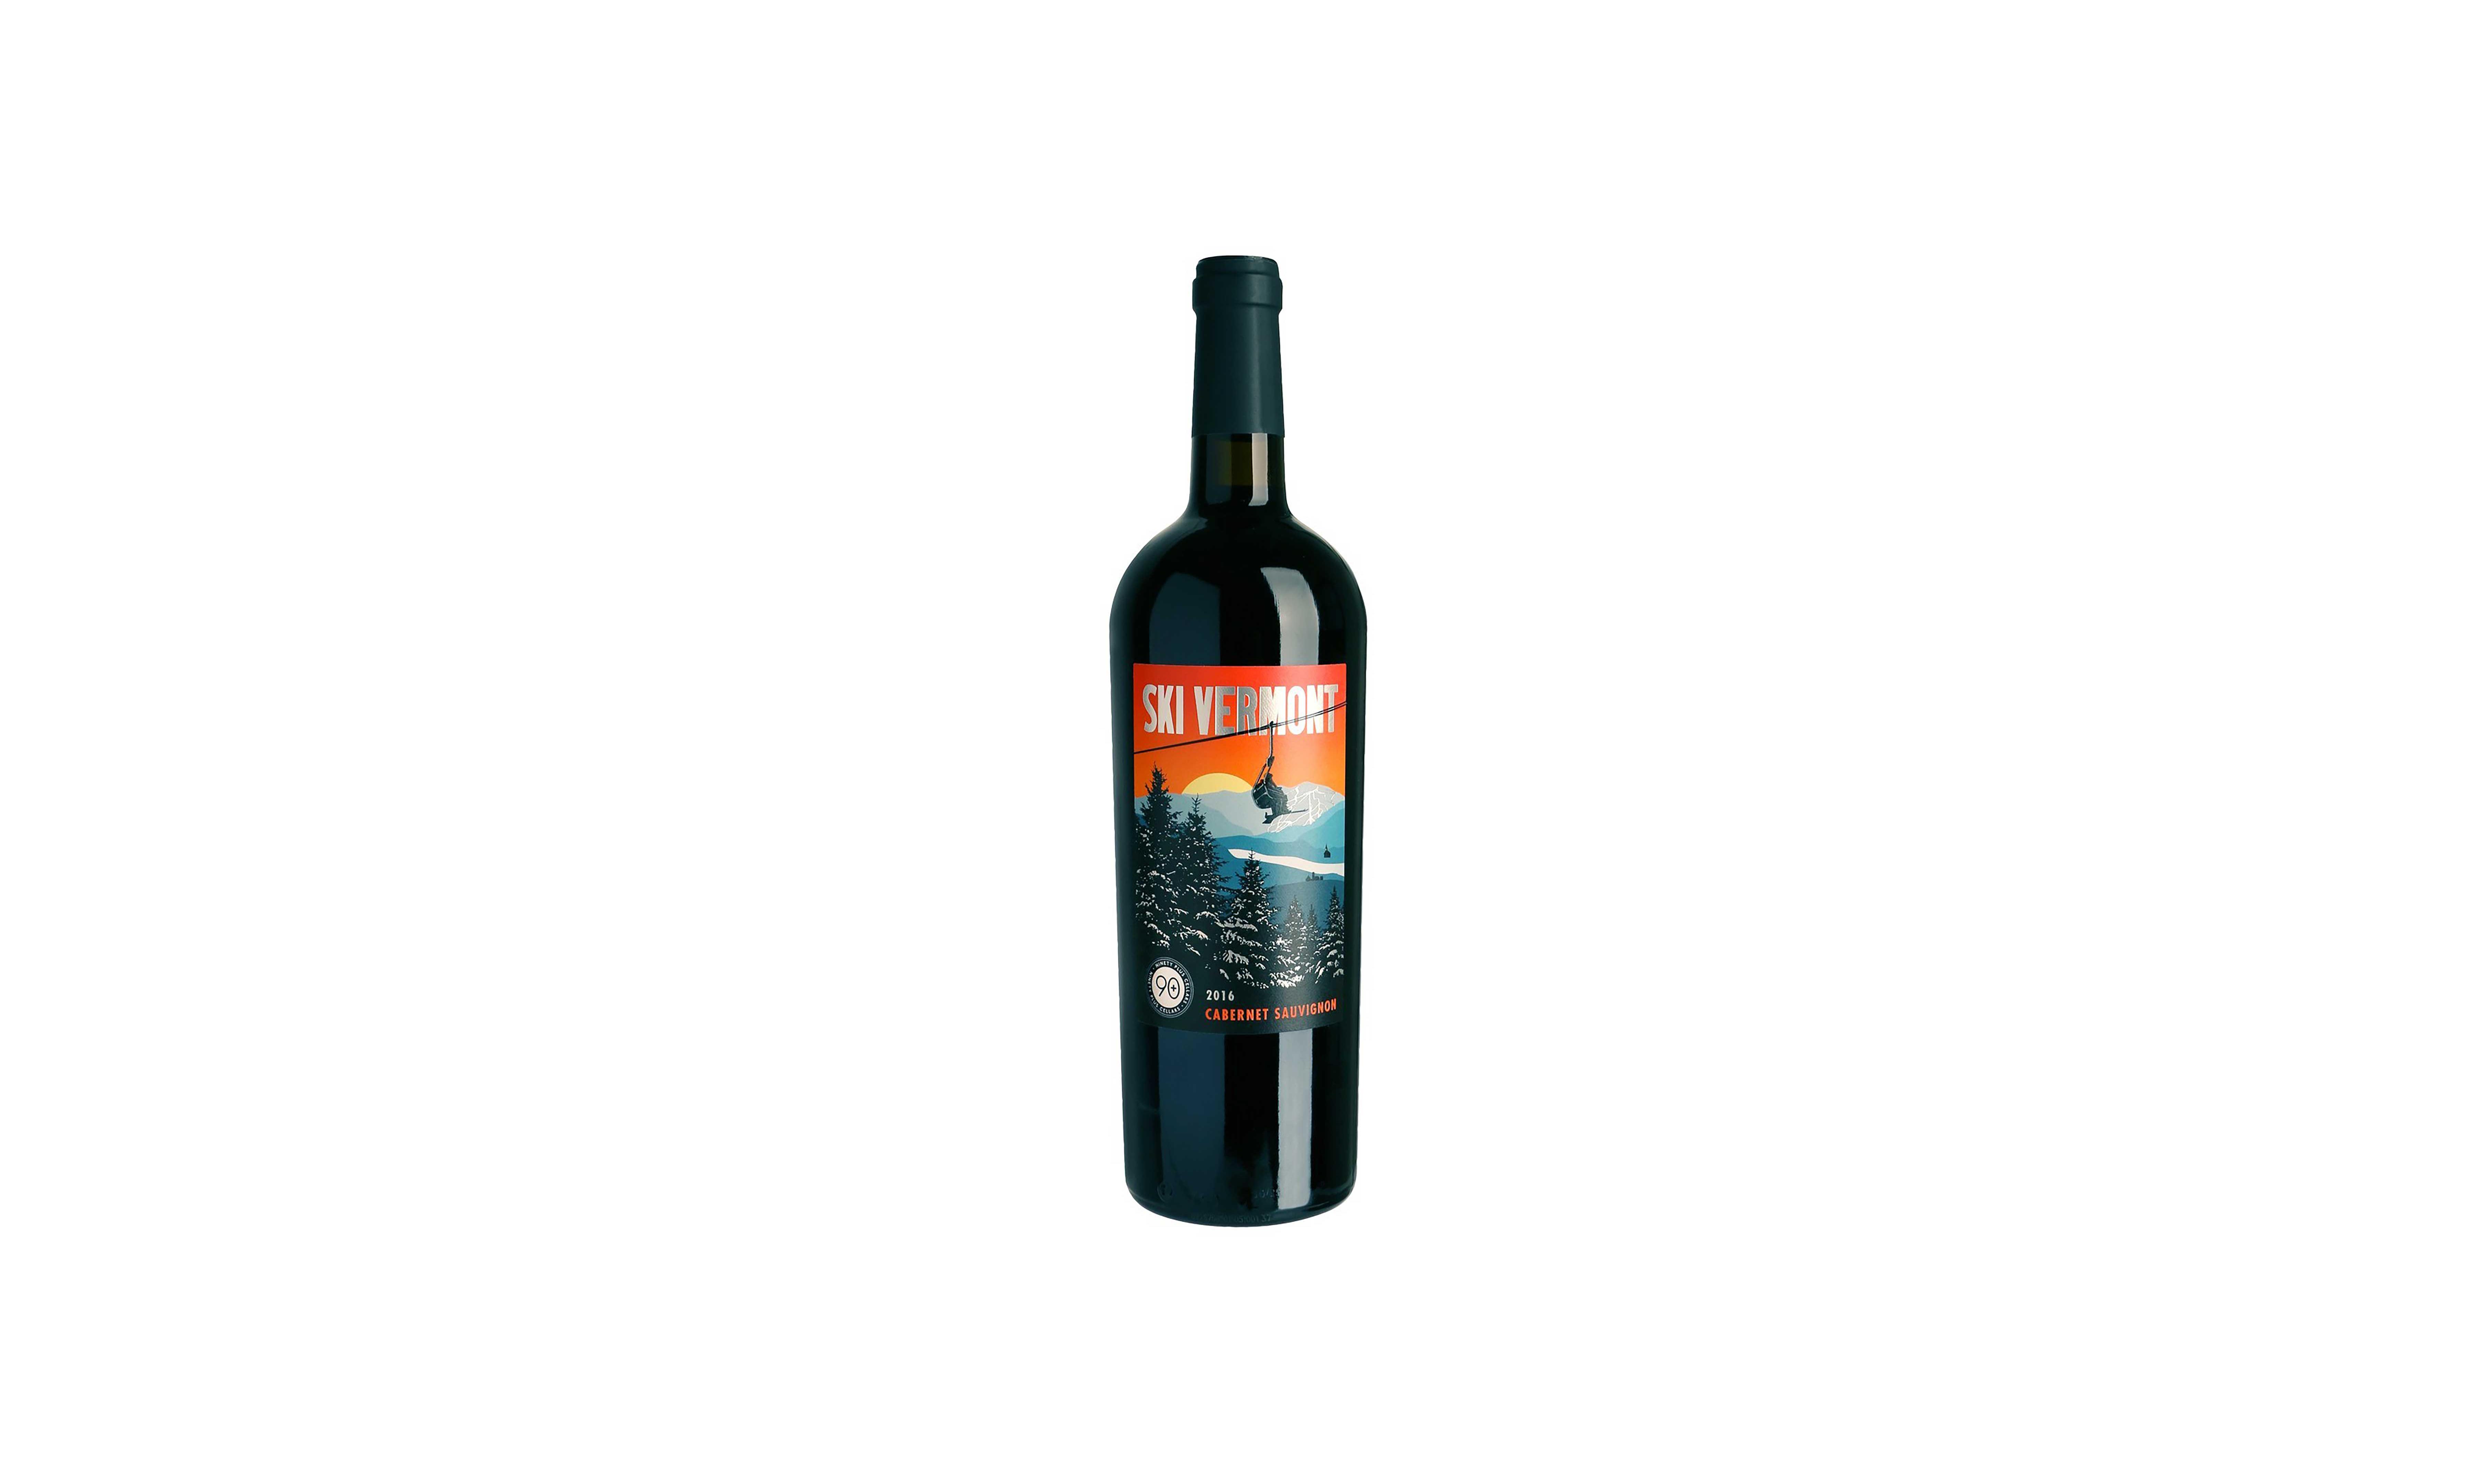 A bottle of Ski Vermont Cabernet Sauvignon